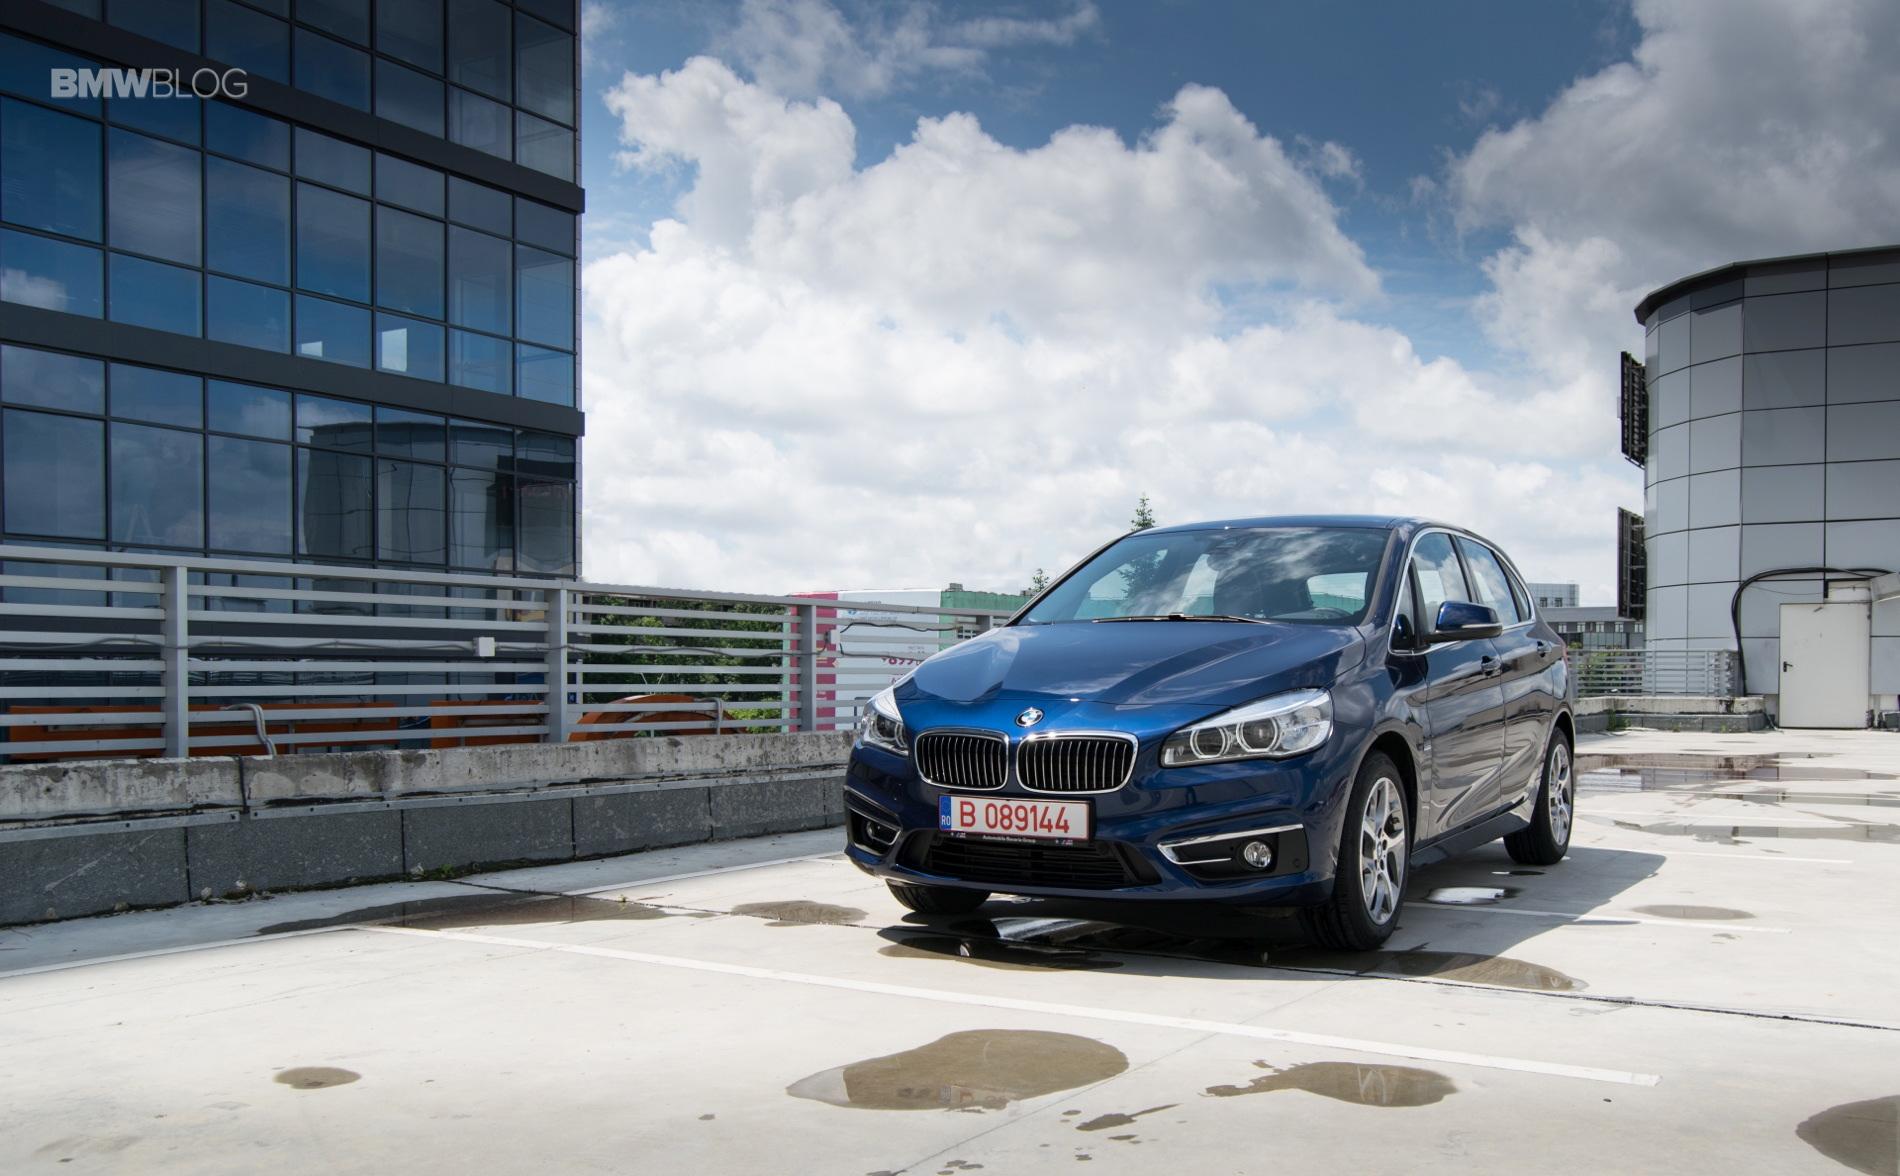 BMW 216d Active Tourer test drive 16